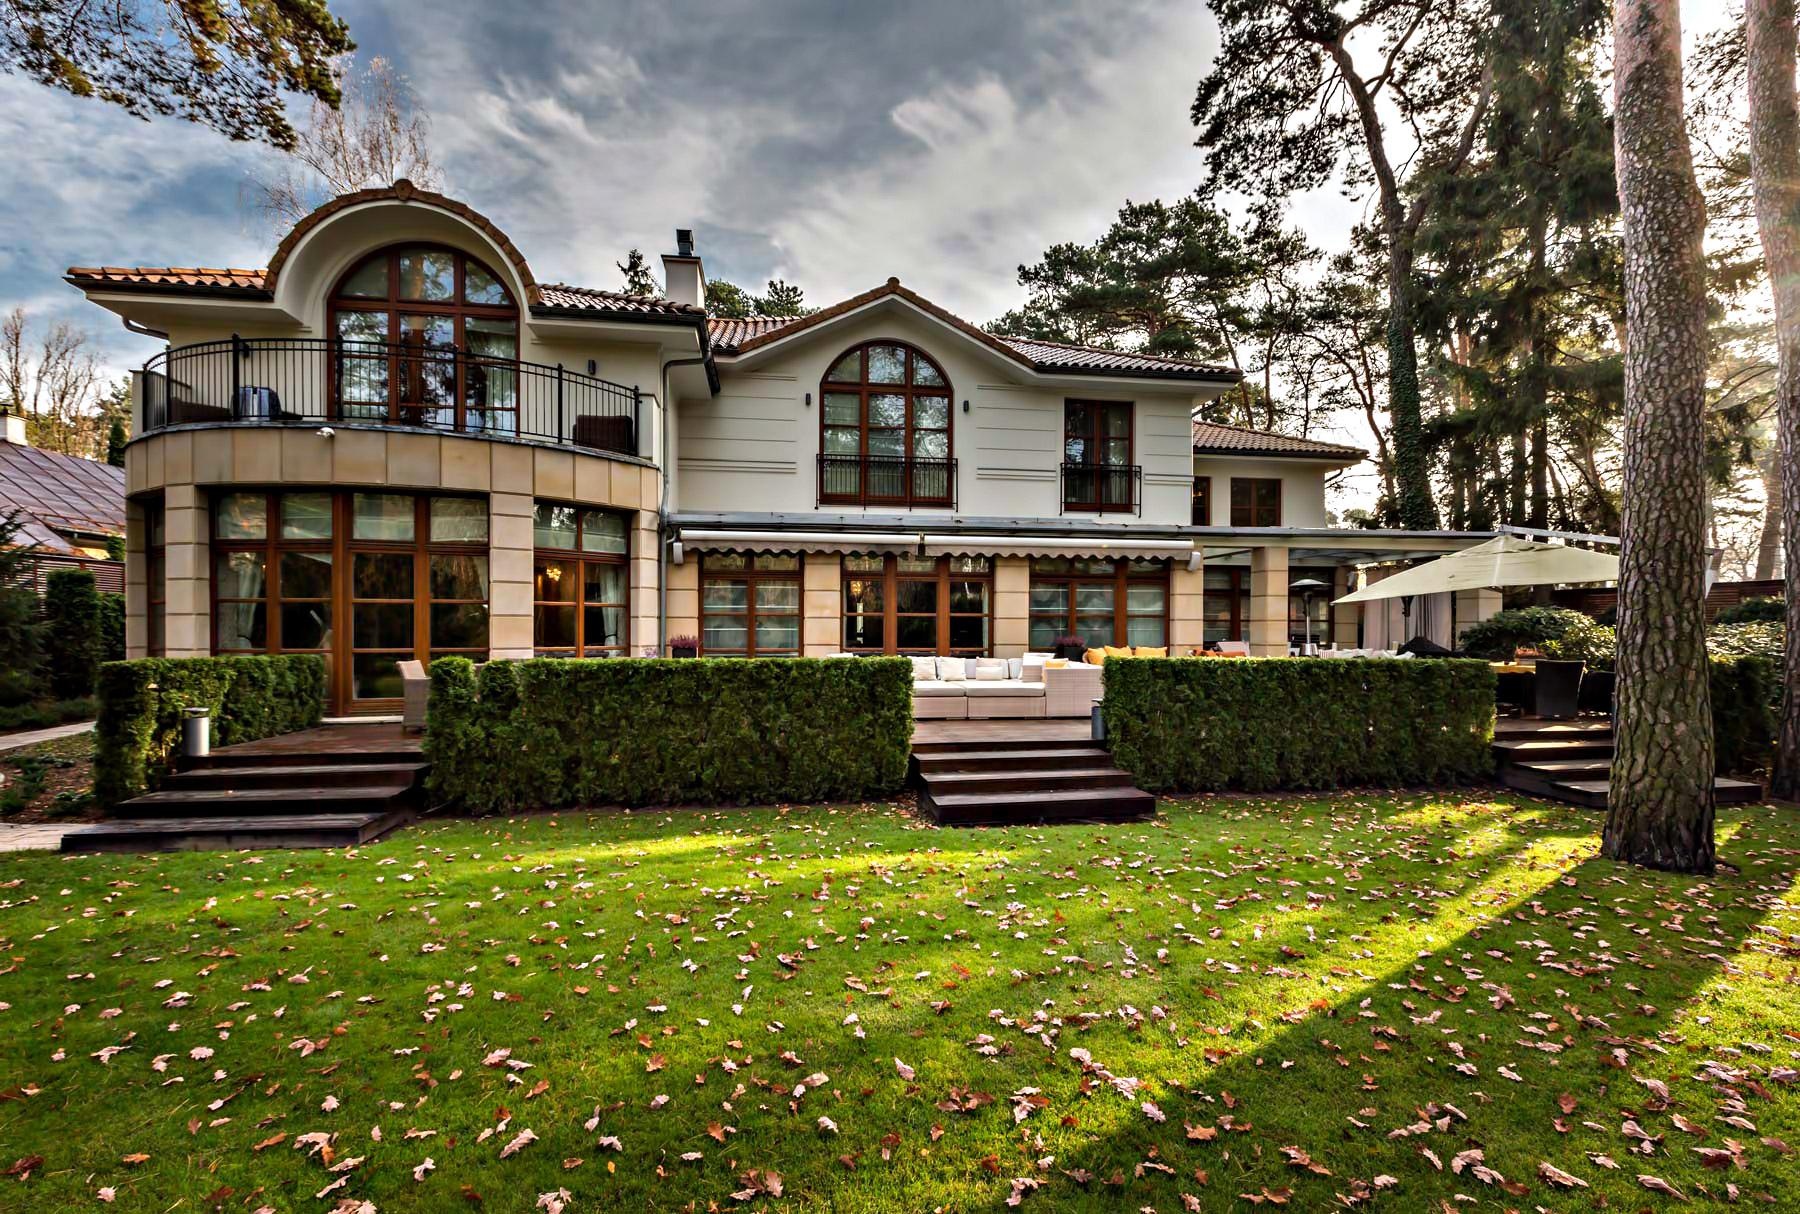 Konstancin Jeziorna Luxury Villa Residence – Warsaw, Poland